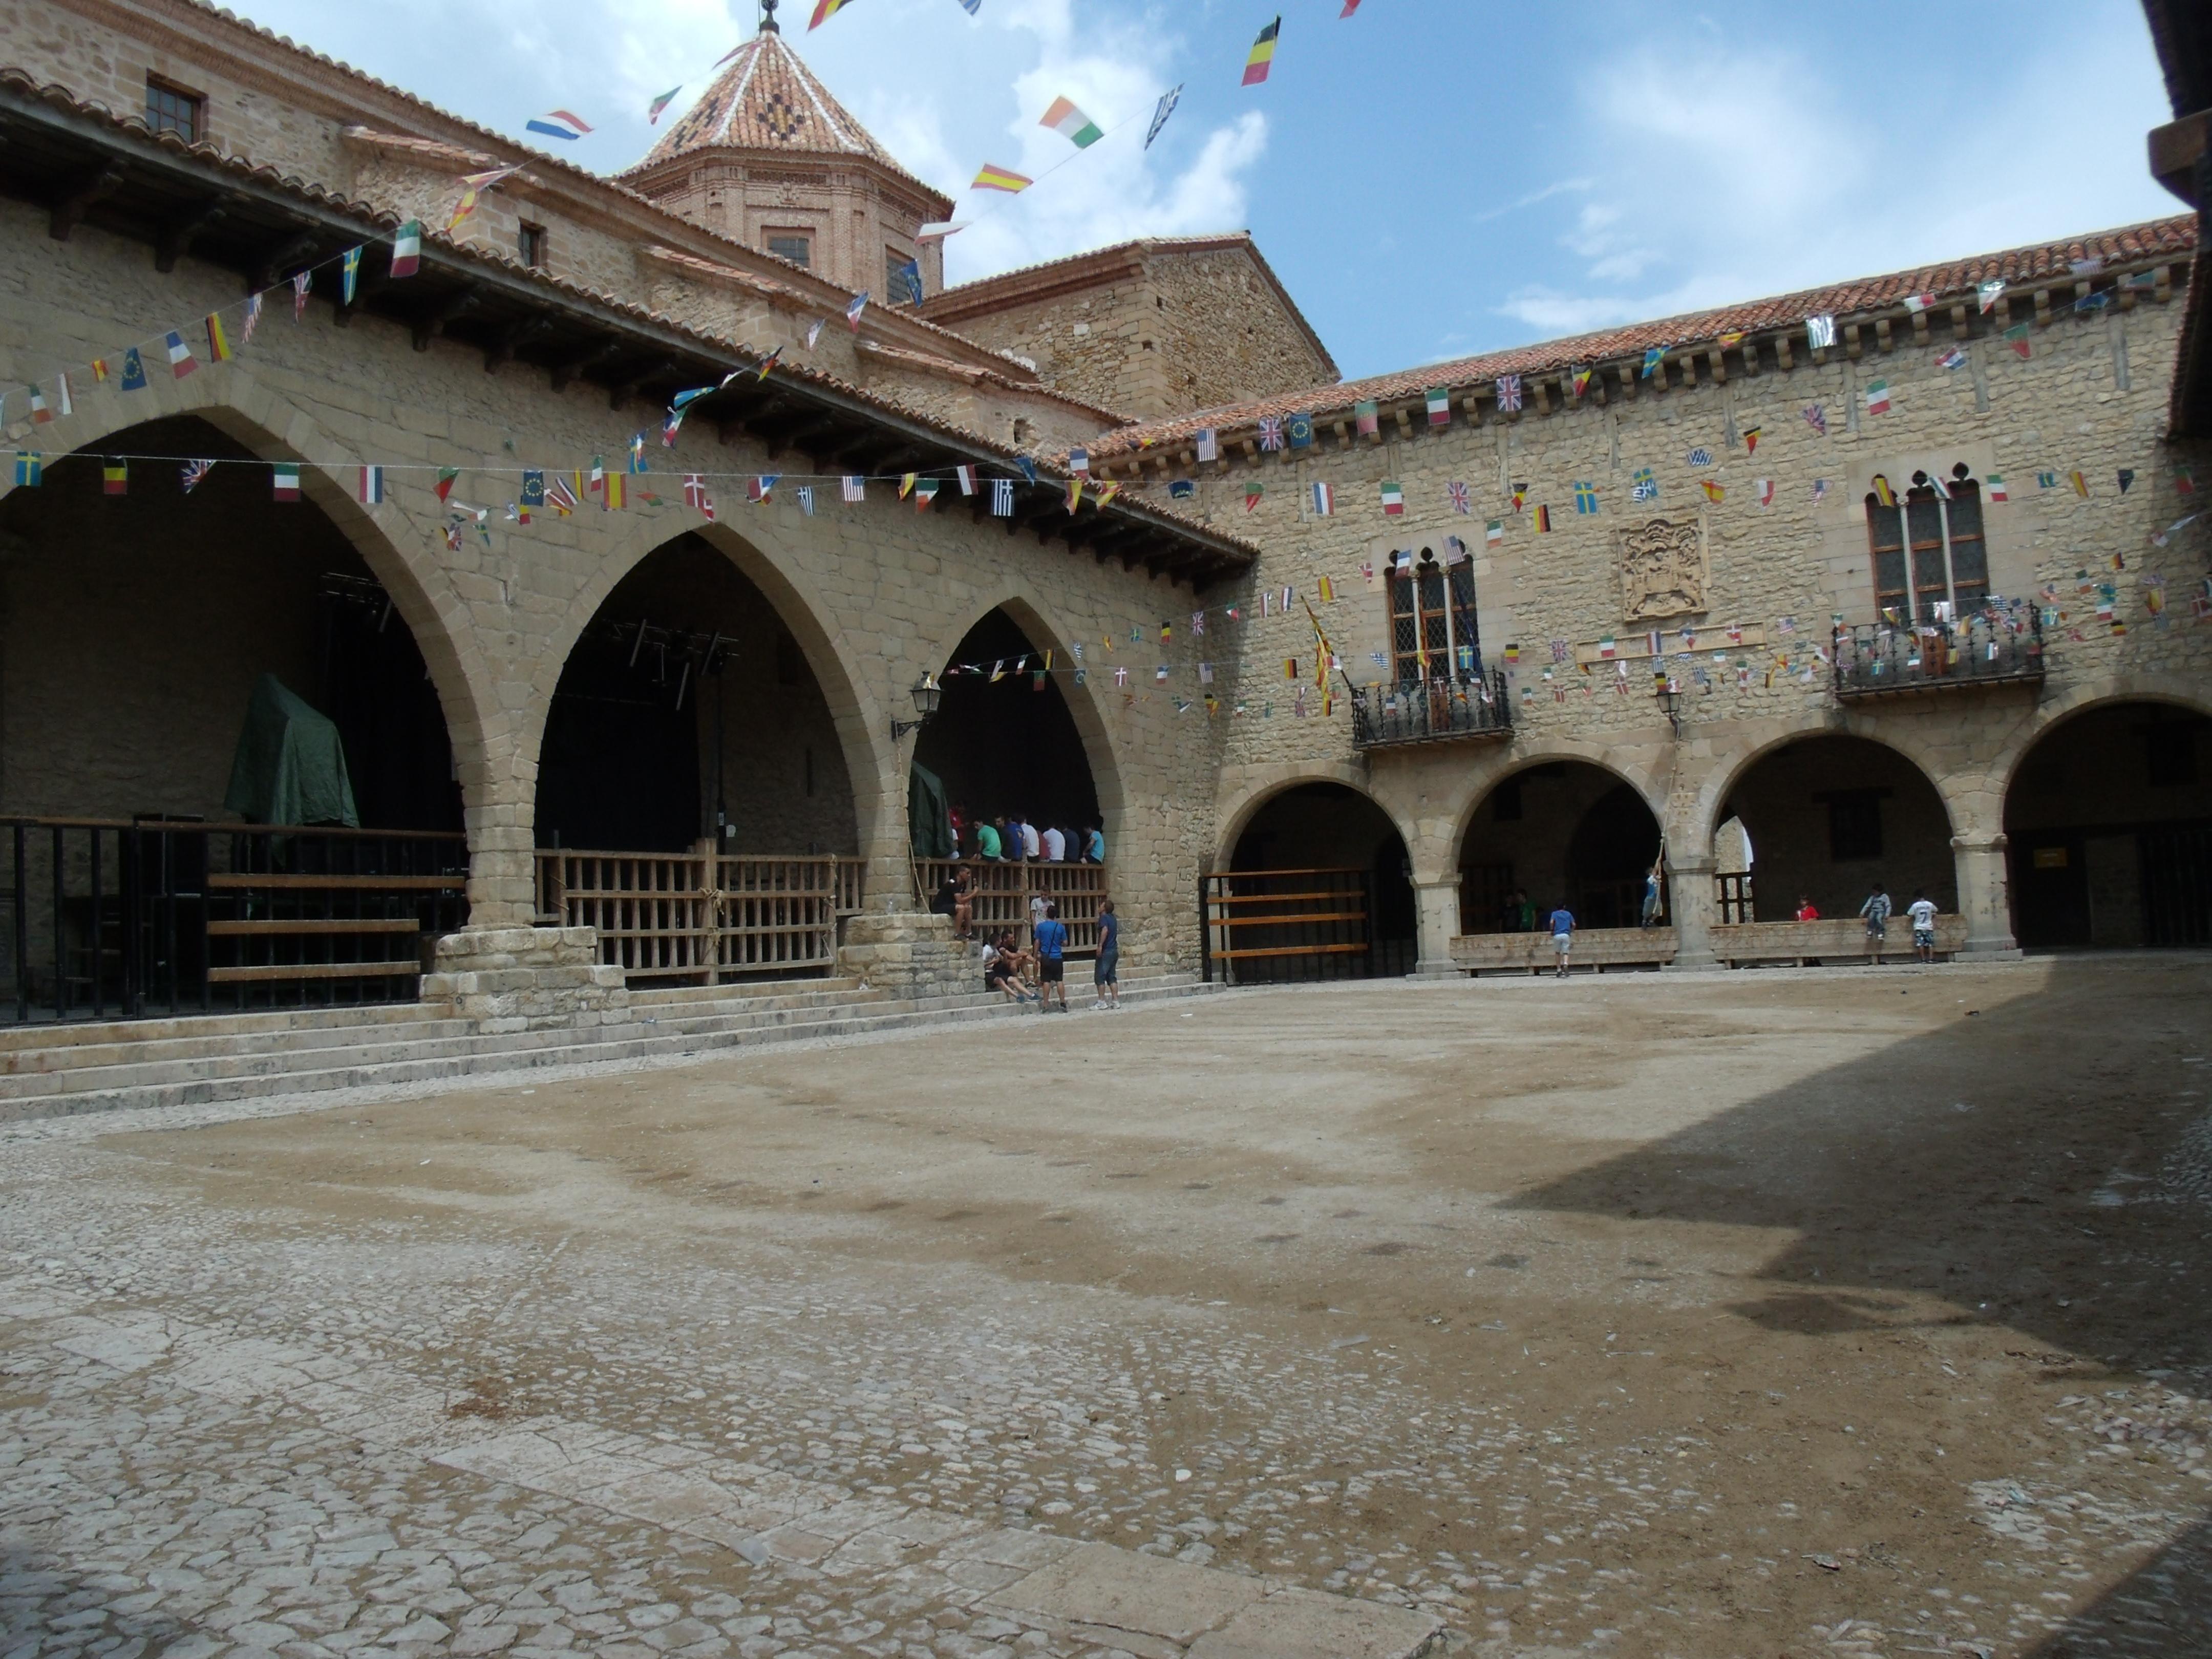 Plaza Mayor de Cantavieja